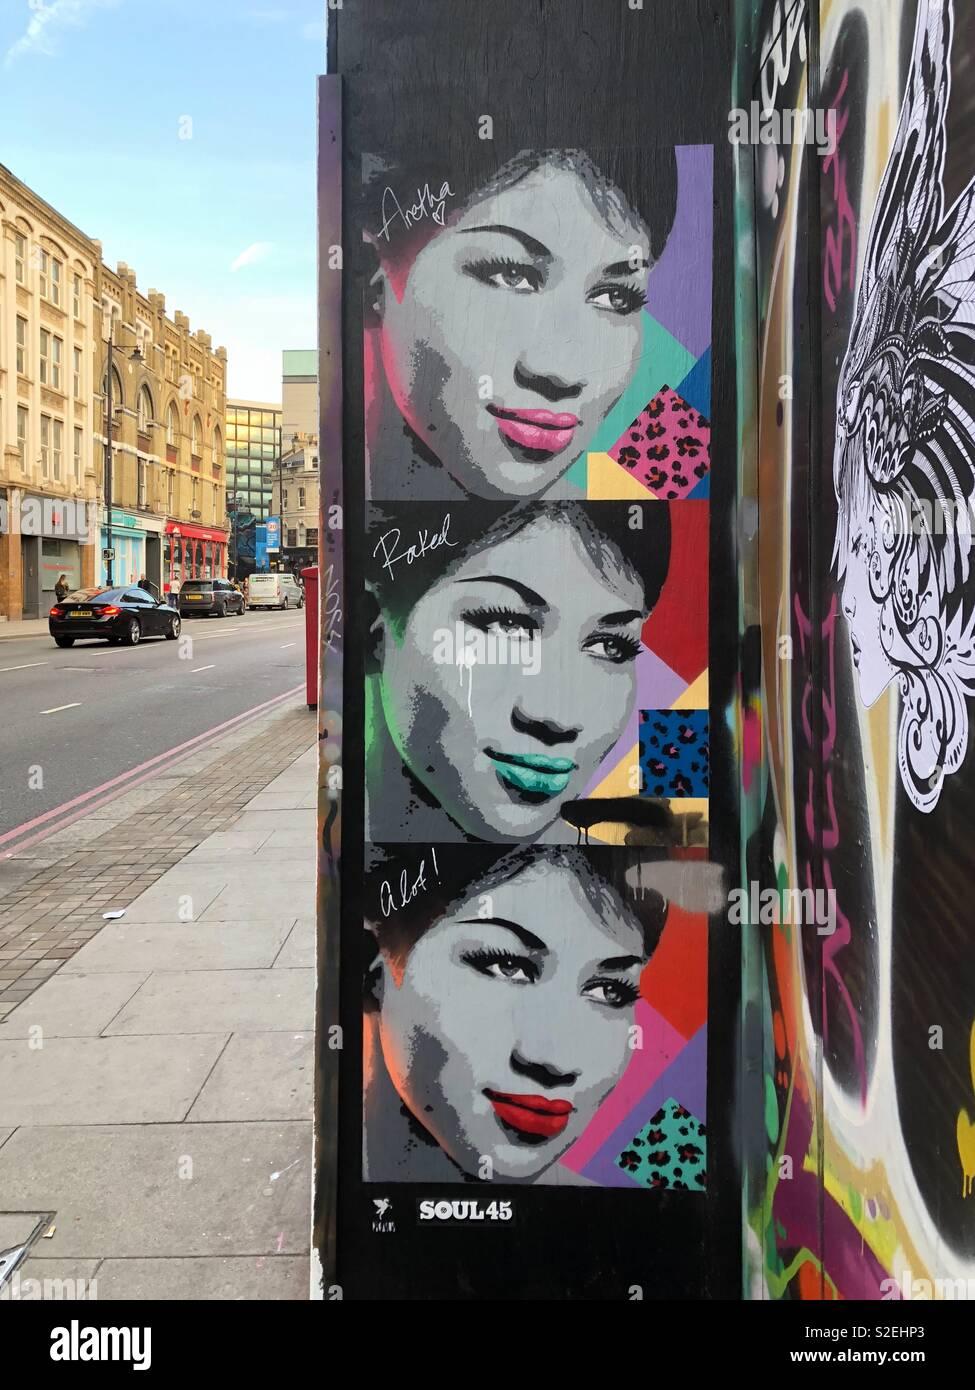 Icono Aretha Franklin estilo pop art graffiti en Hoxton, Londres, Inglaterra. Foto de stock